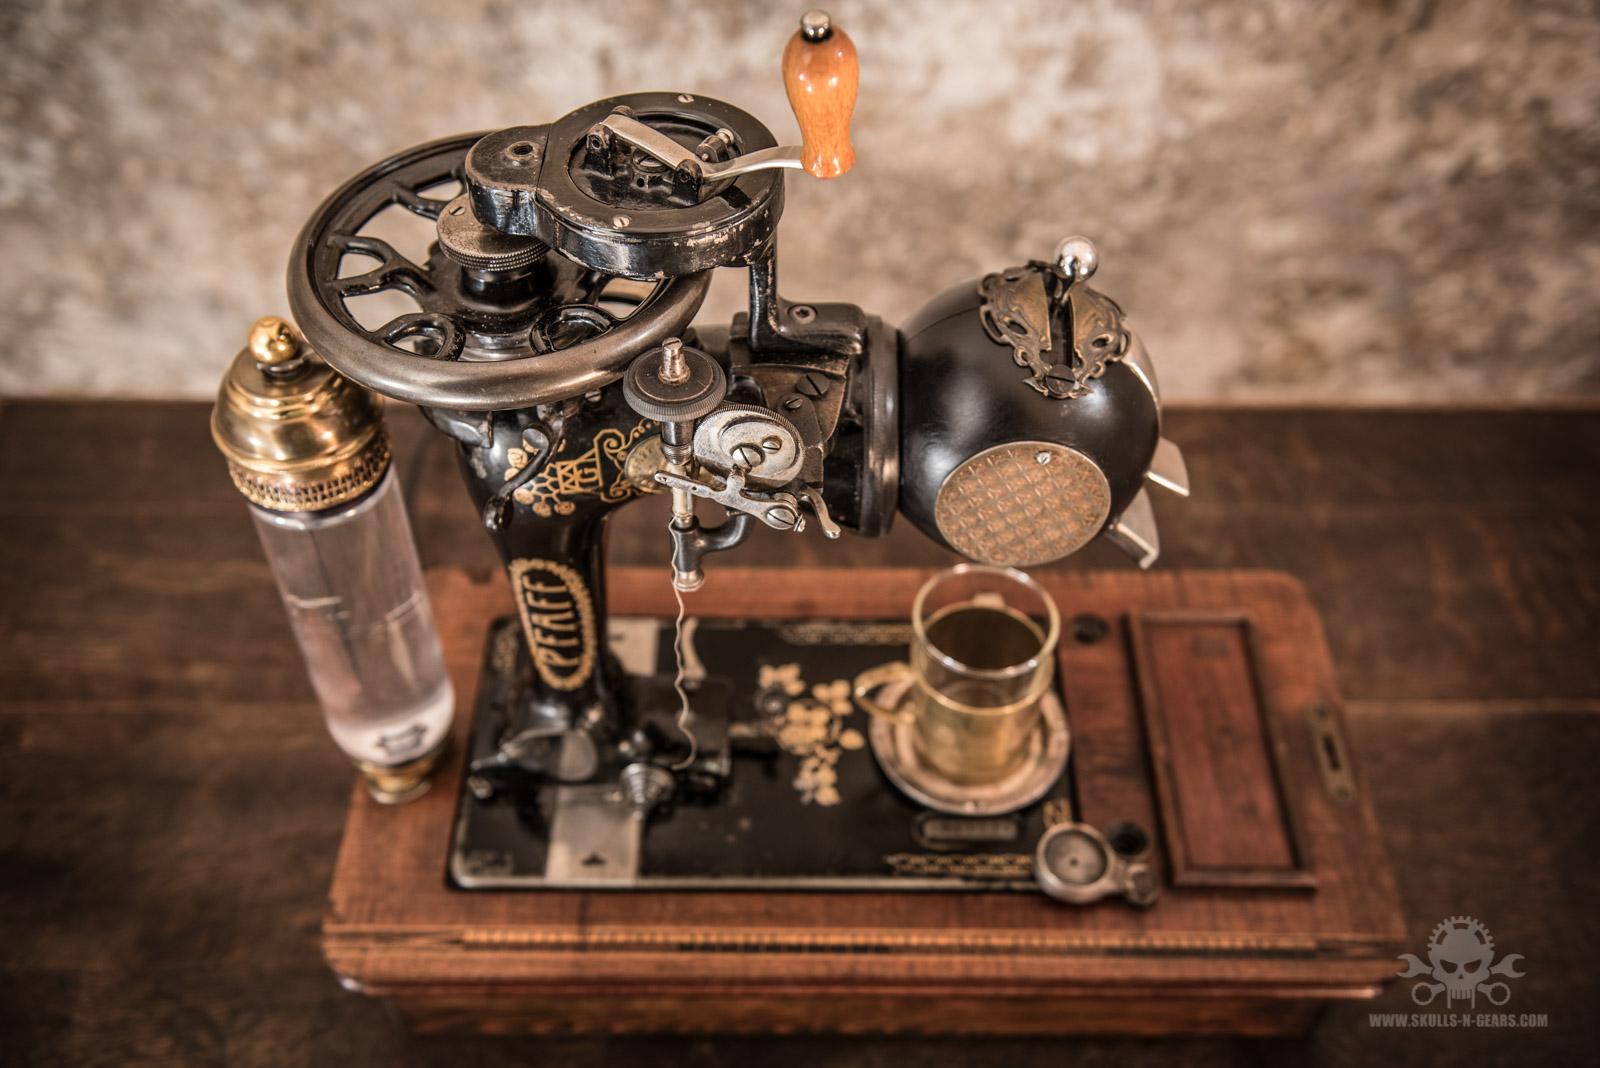 Steampunk_Coffee_Machine-13